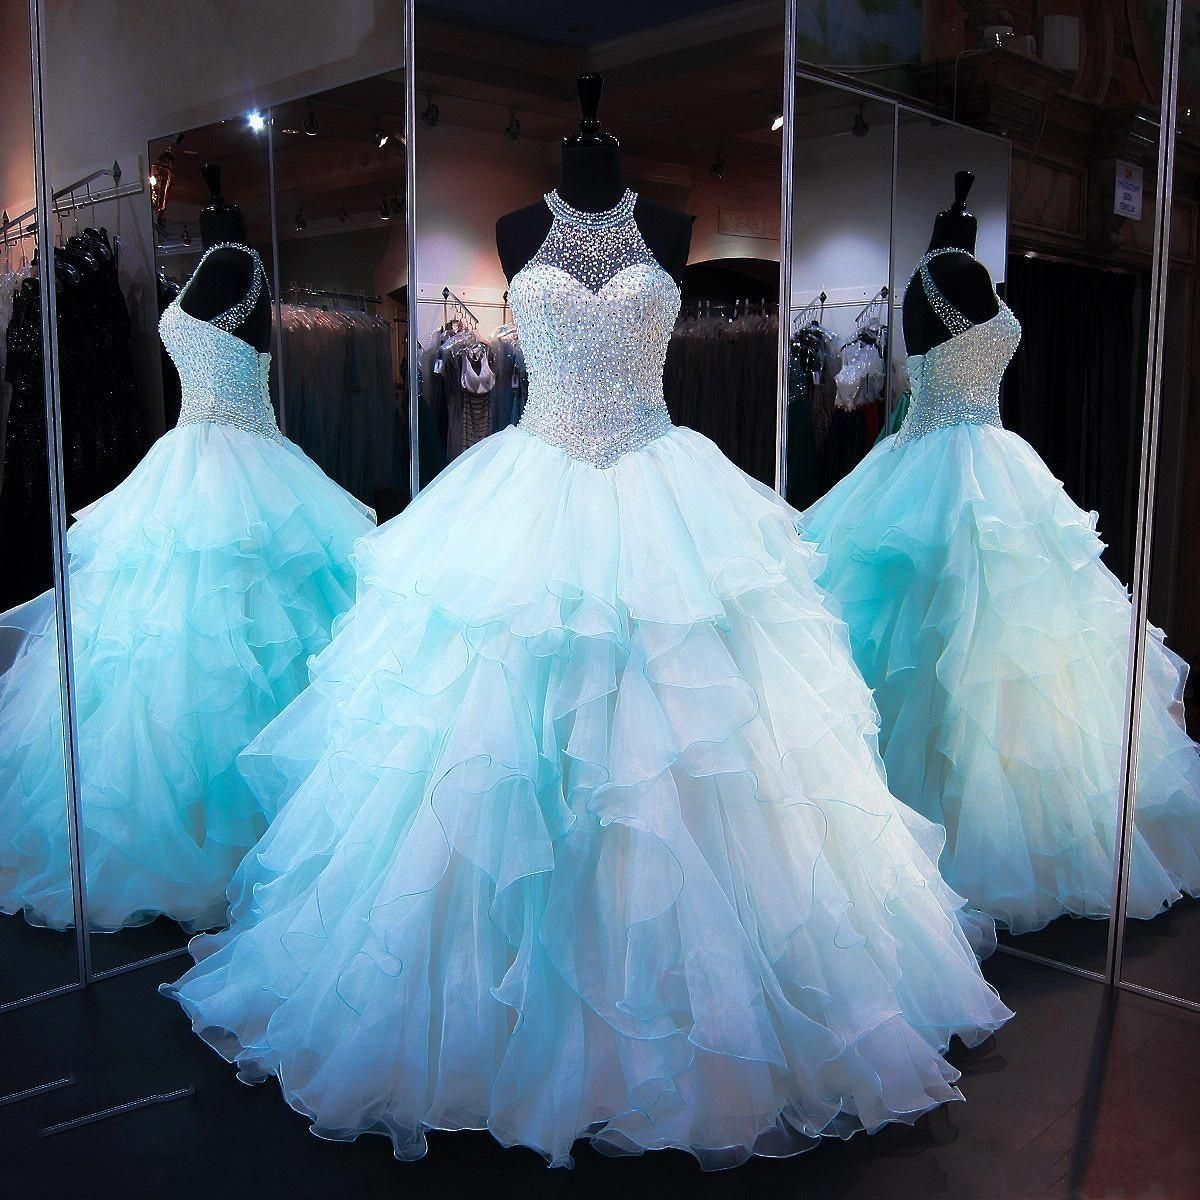 Aqua quinceanera dresses 2018 modest masquerade ball gown